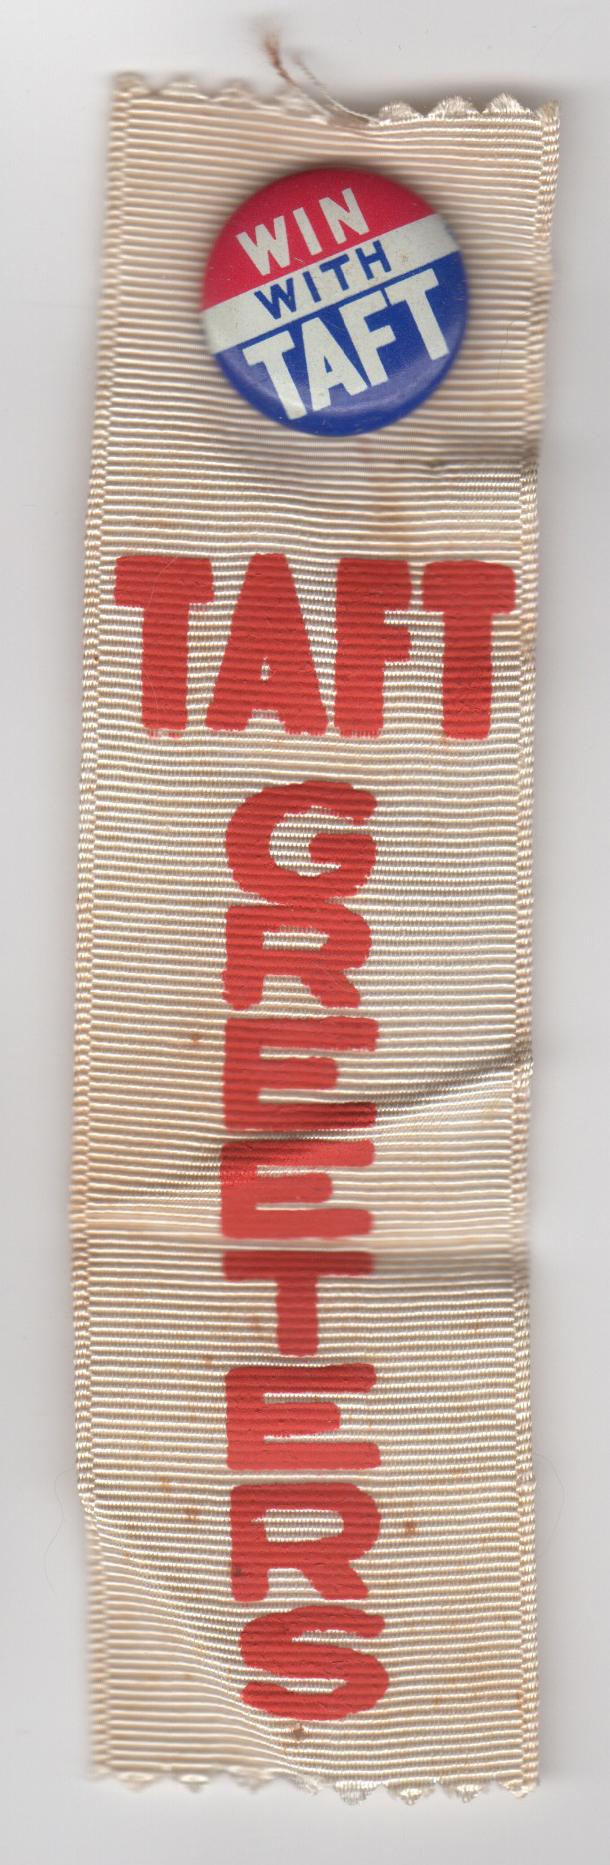 OHPres1952-15 TAFT.jpg